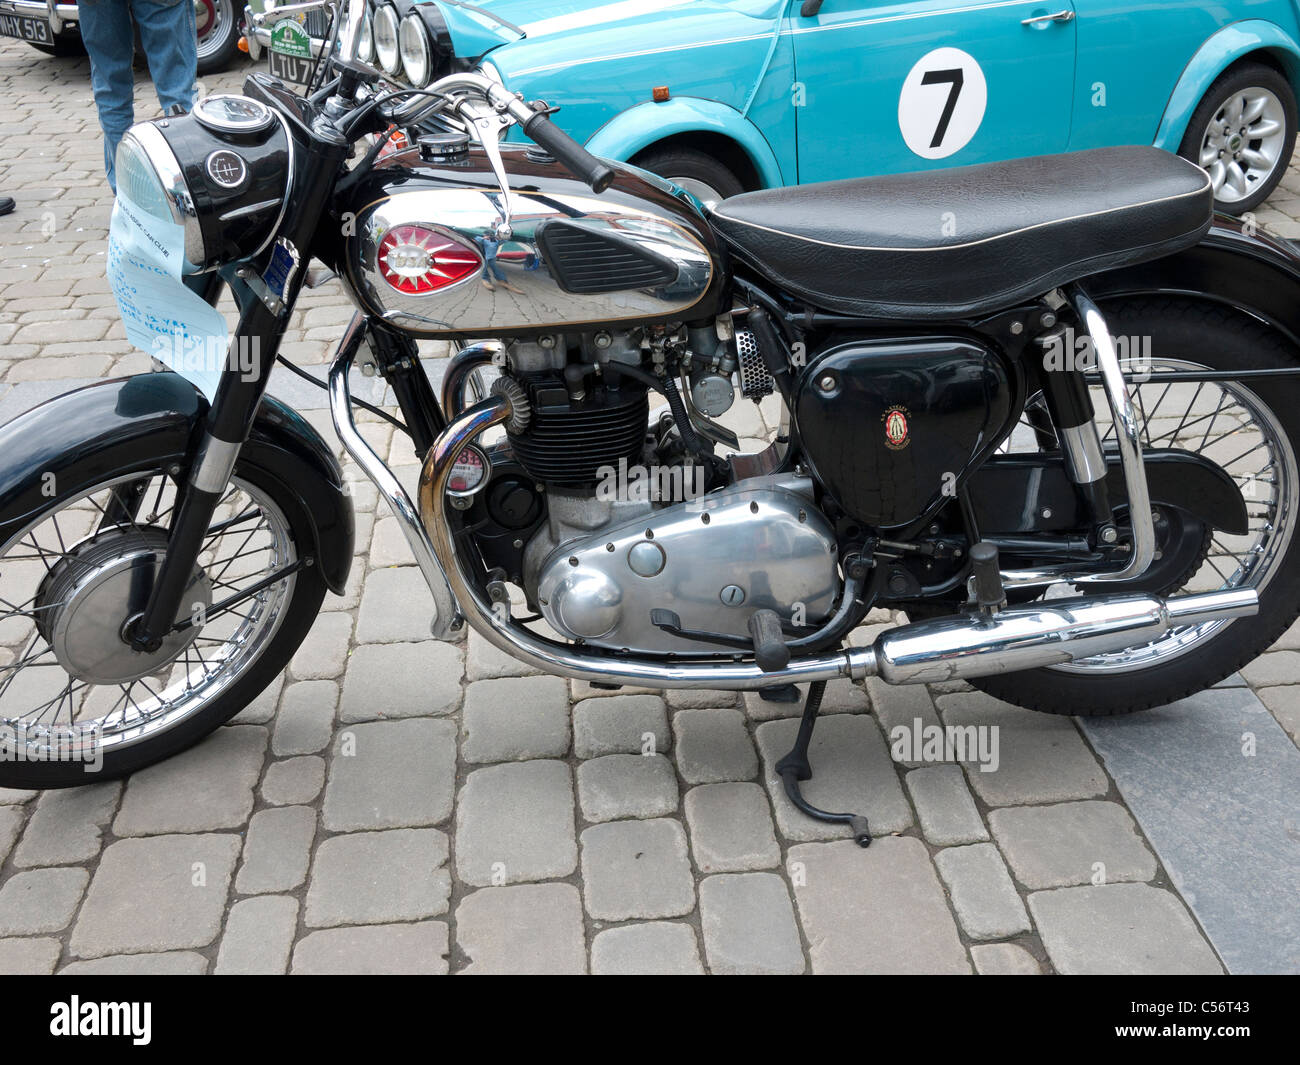 BSA A10 650cc Motorbike 1960 Vintage